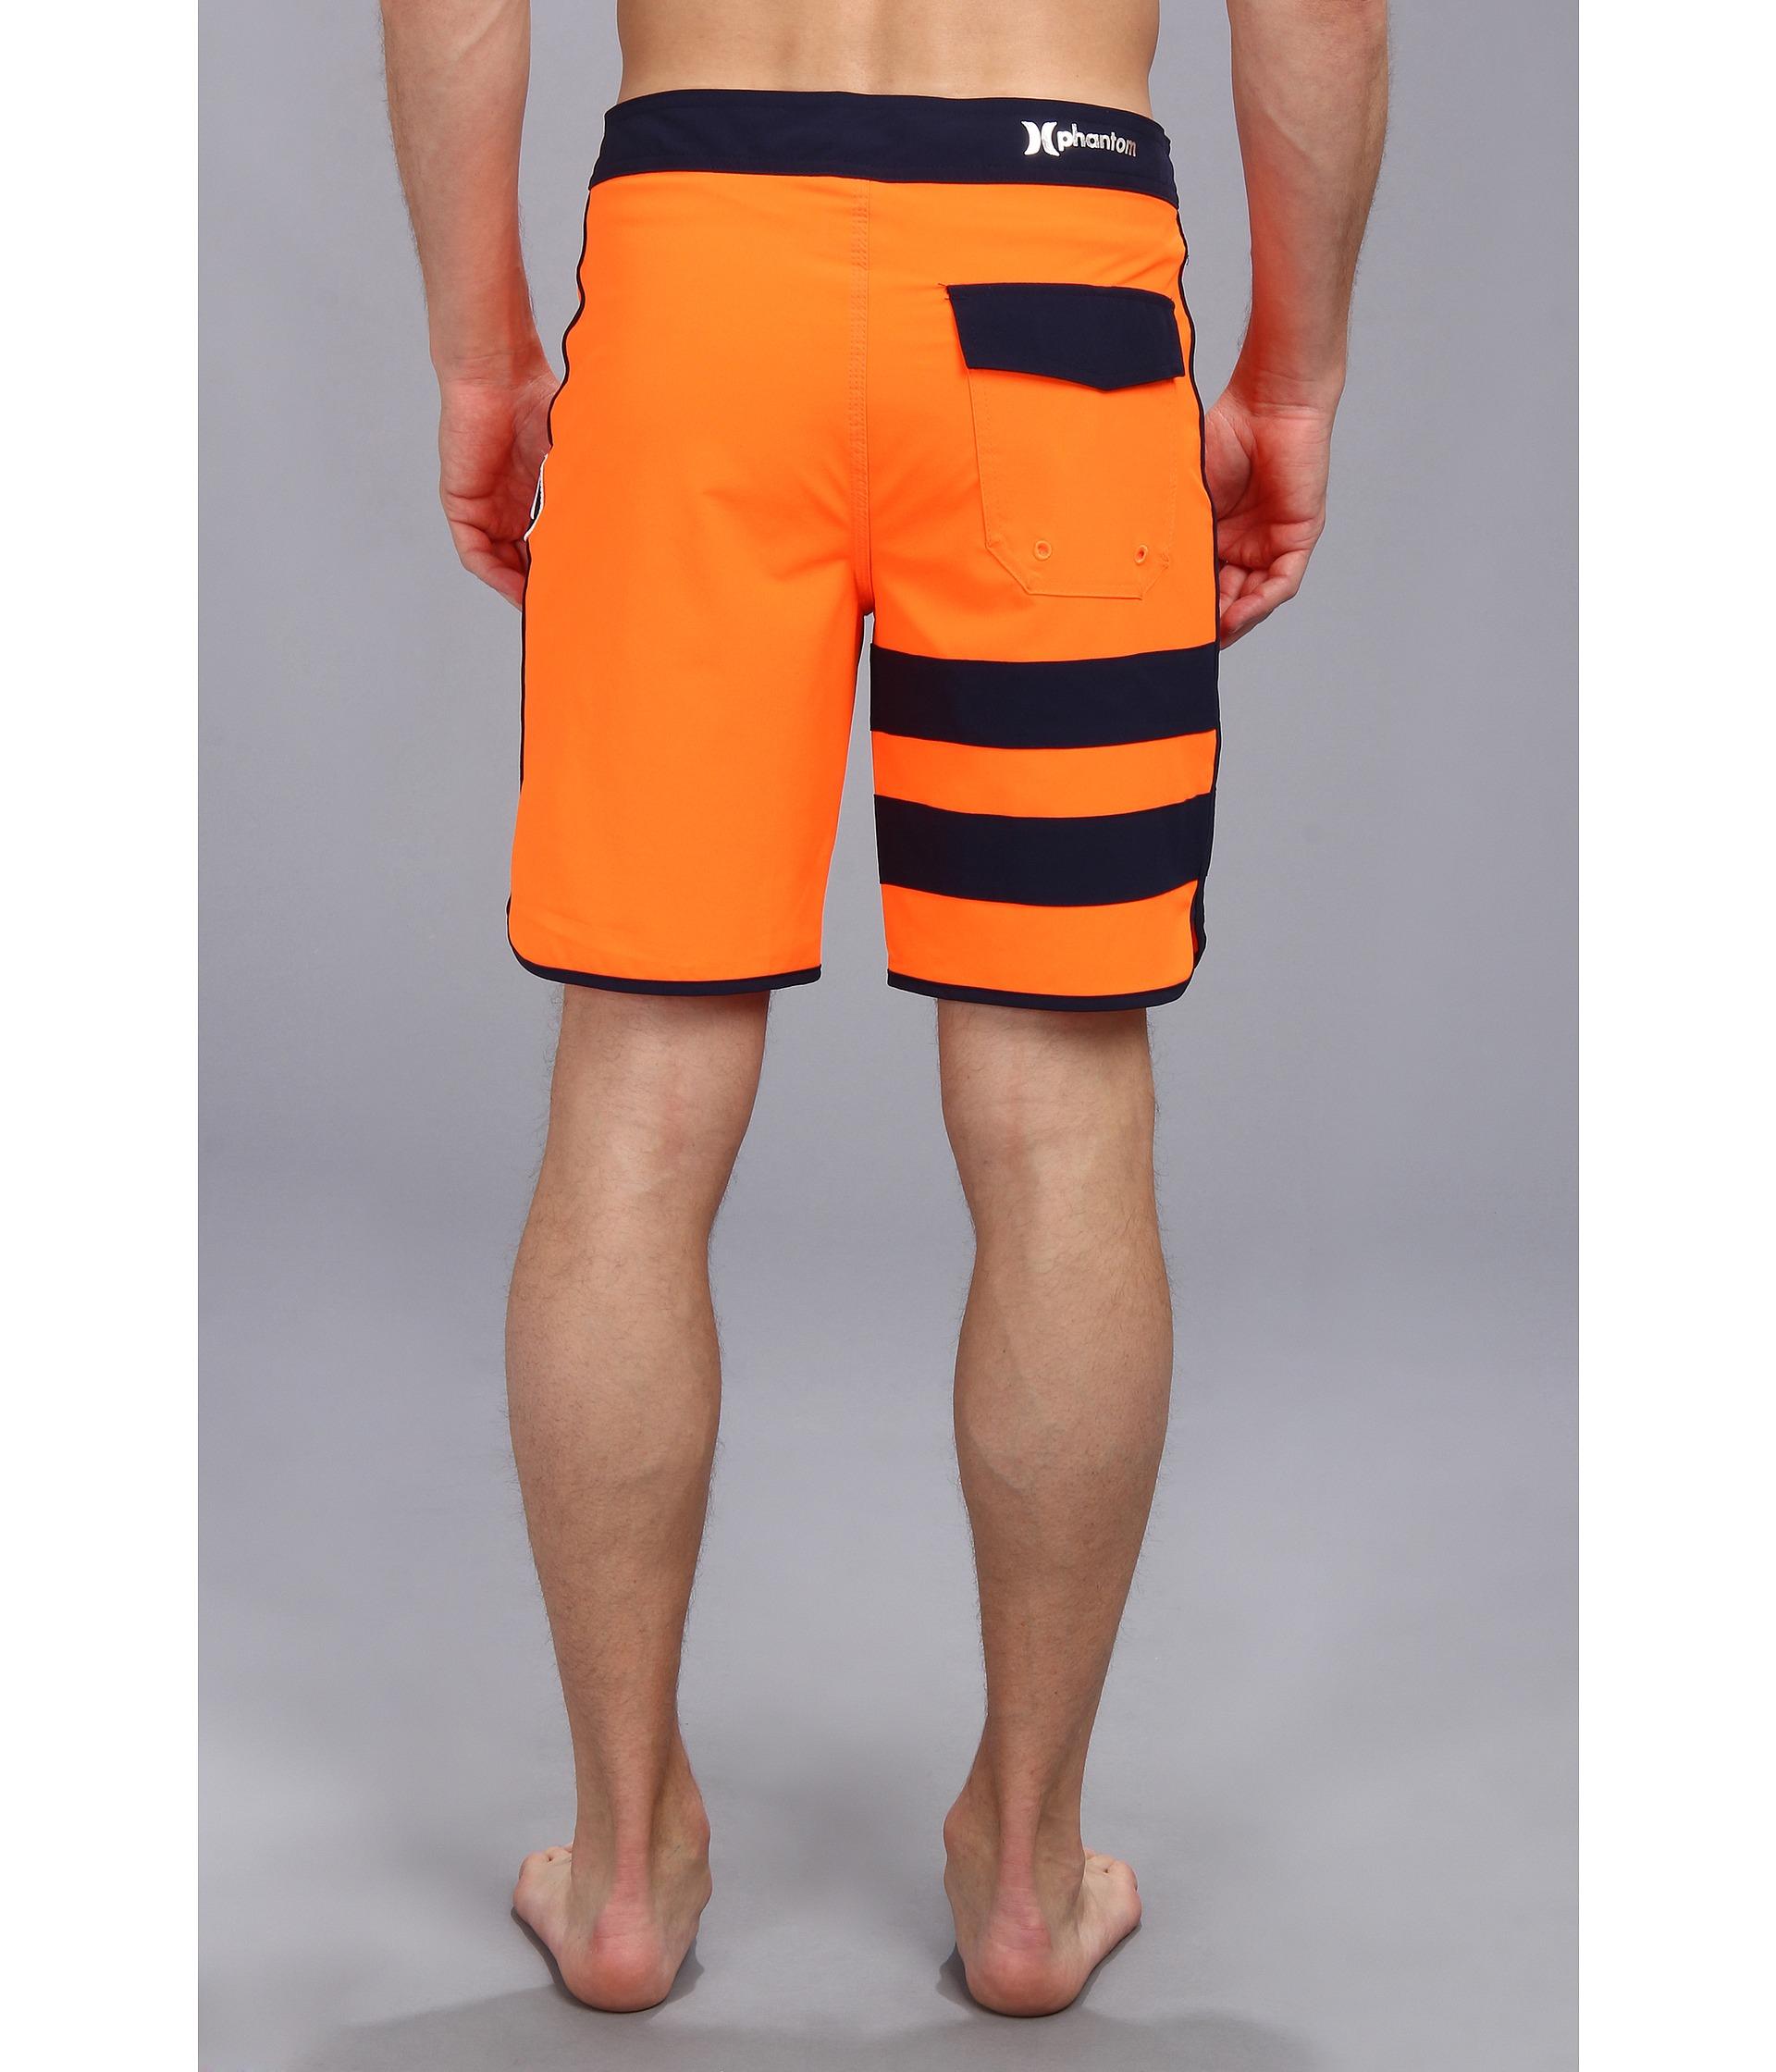 335f51f580 Hurley Phantom 60 Block Party Boardshort in Orange for Men - Lyst